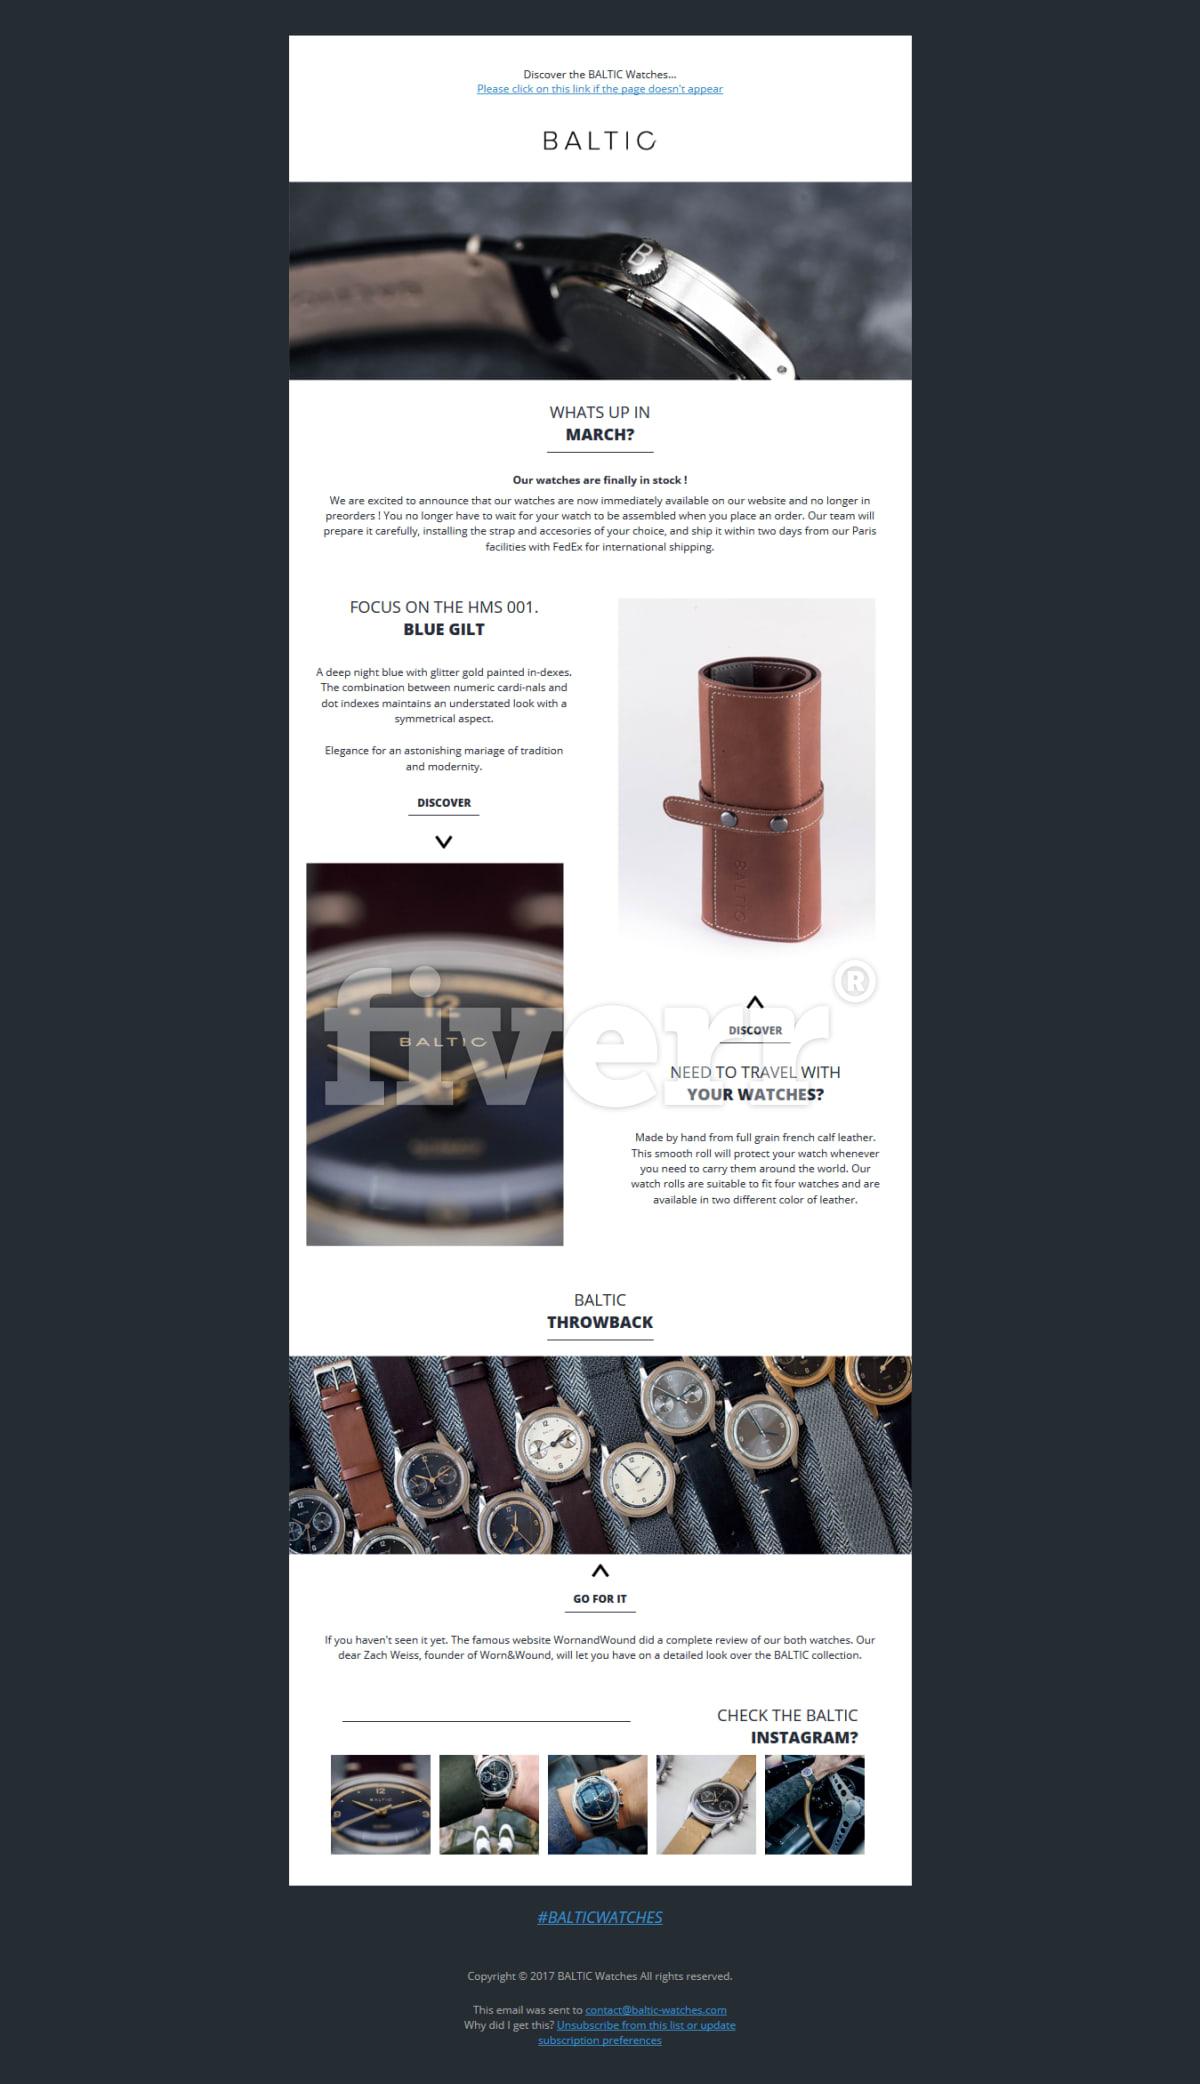 Design newsletter, html template, emailer by Sujanshrestha